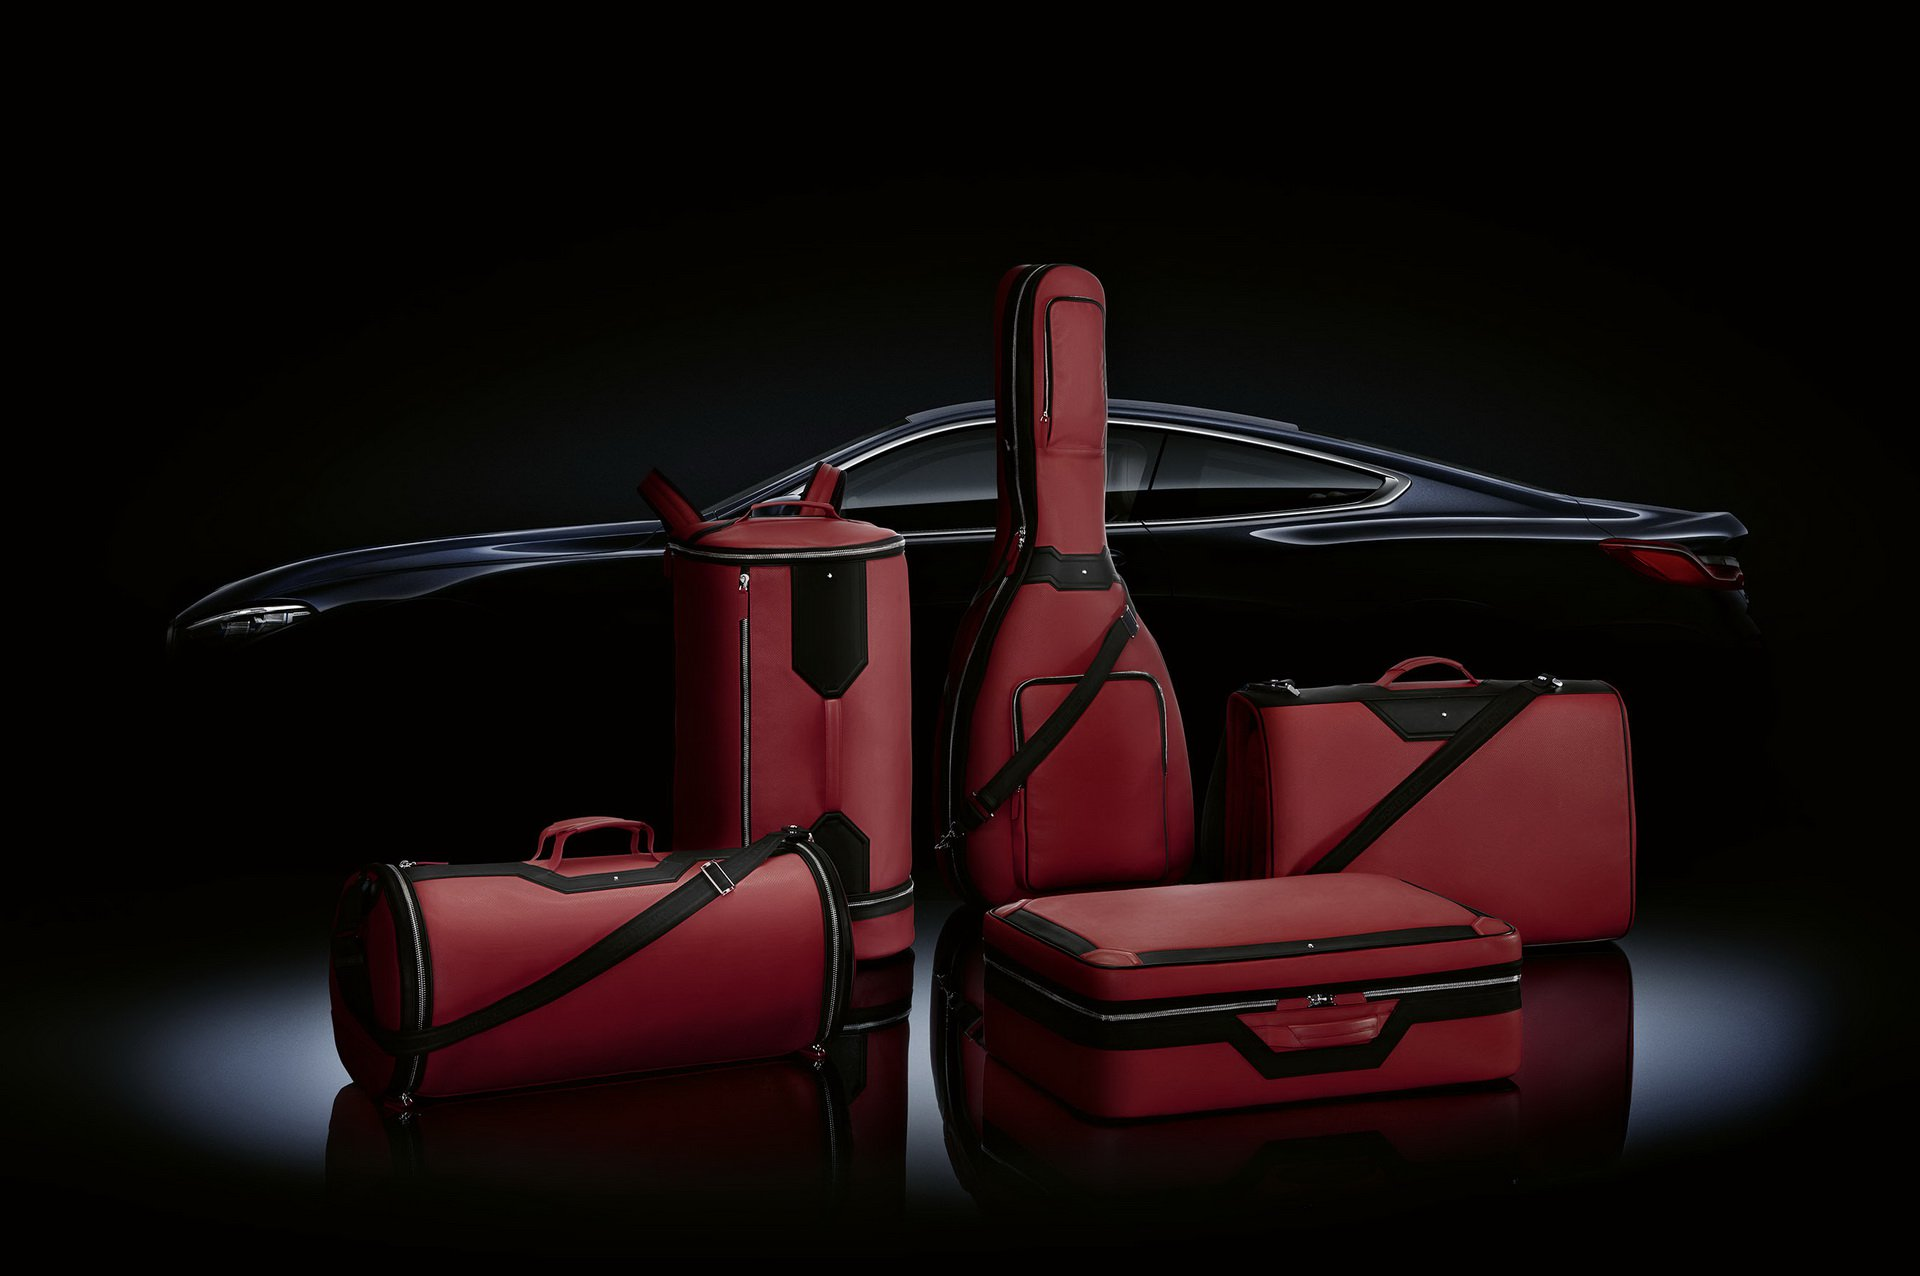 Набор сумок для БМВ 8 оценили дороже нового автомобиля